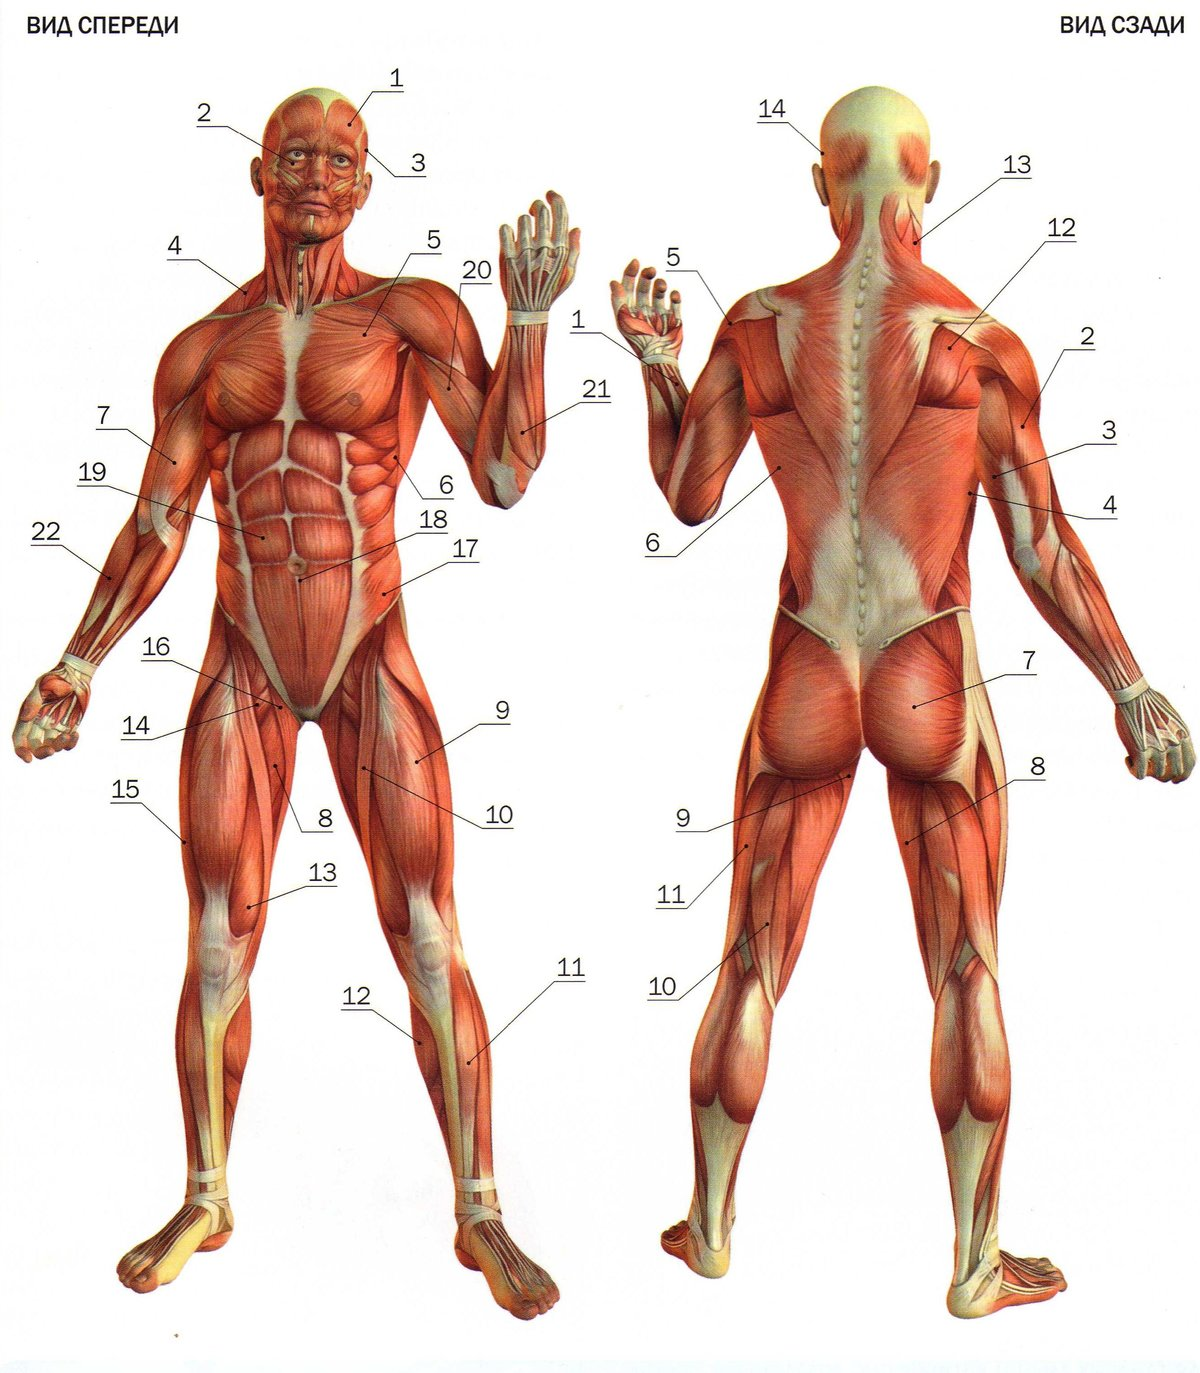 мне анатомия мышц человека бодибилдинг фото нажмите активную кнопку